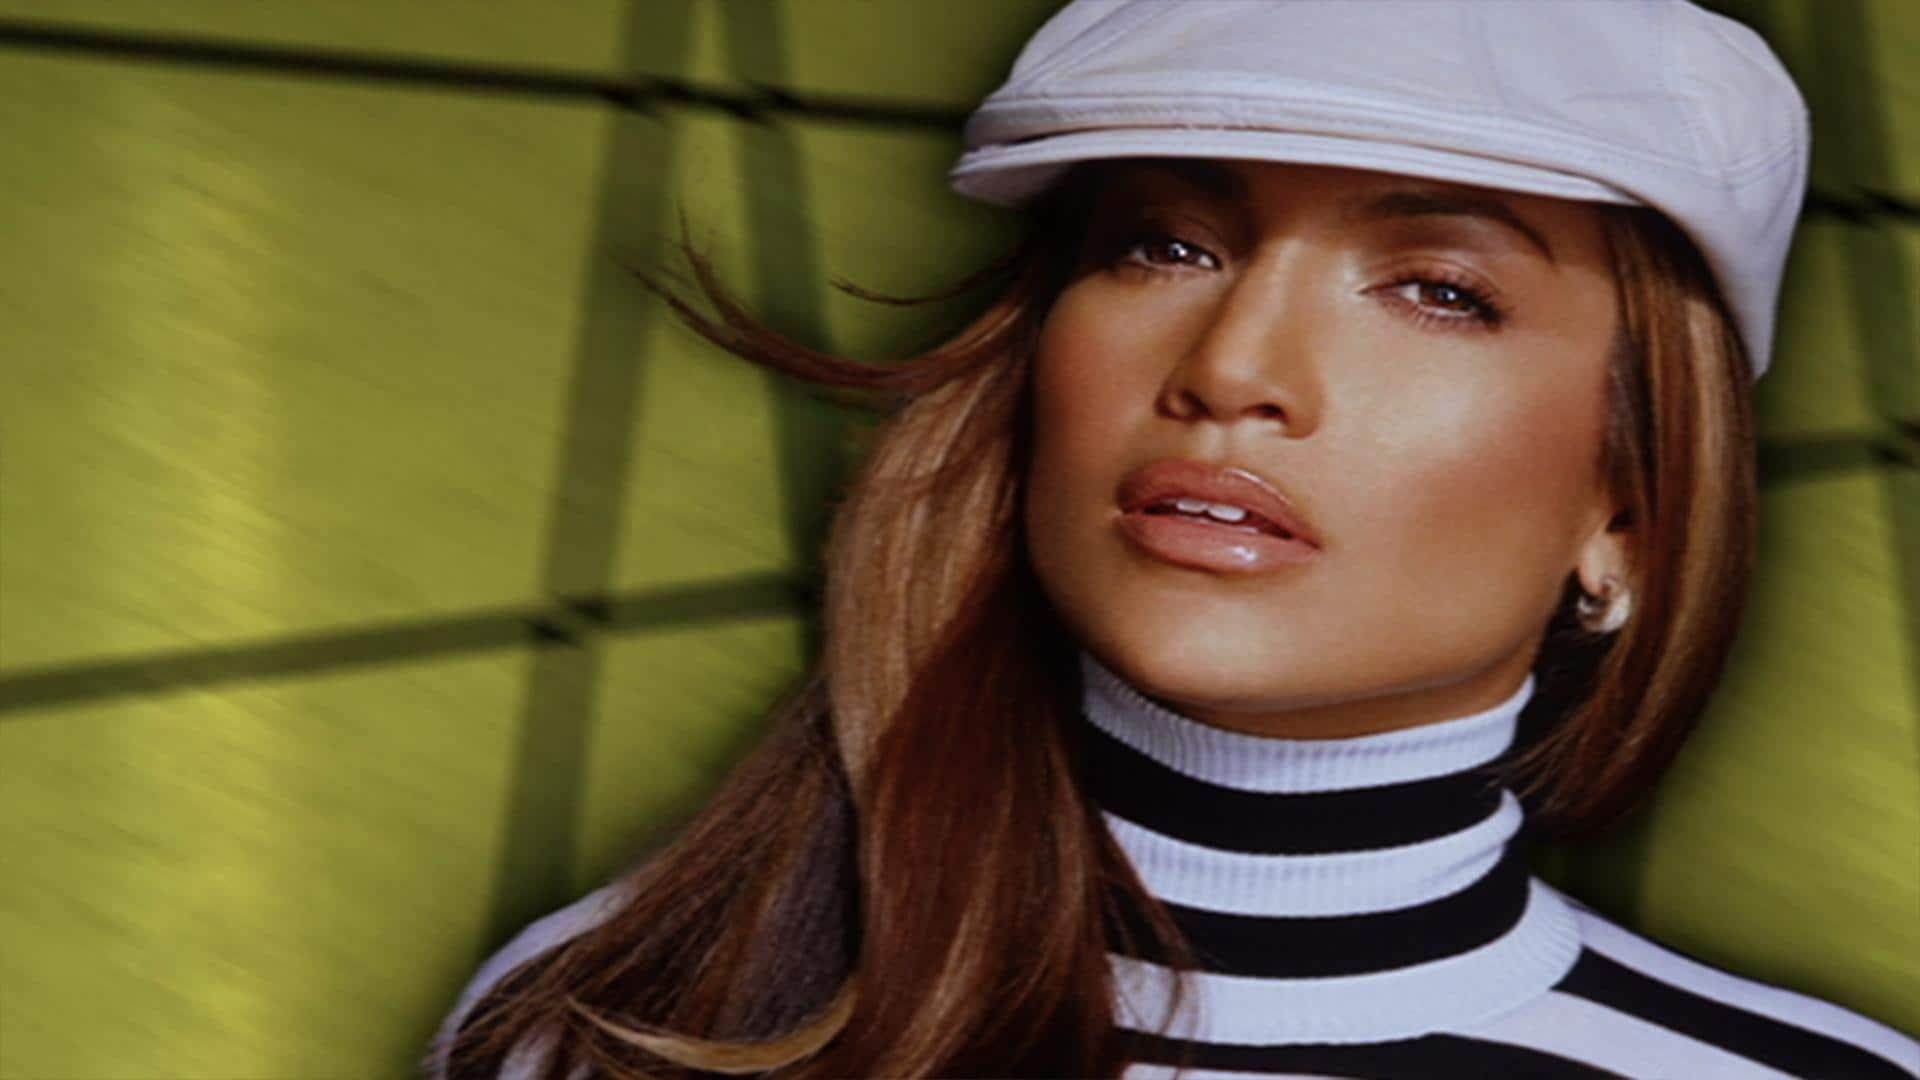 Jennifer Lopez: February 10, 2001